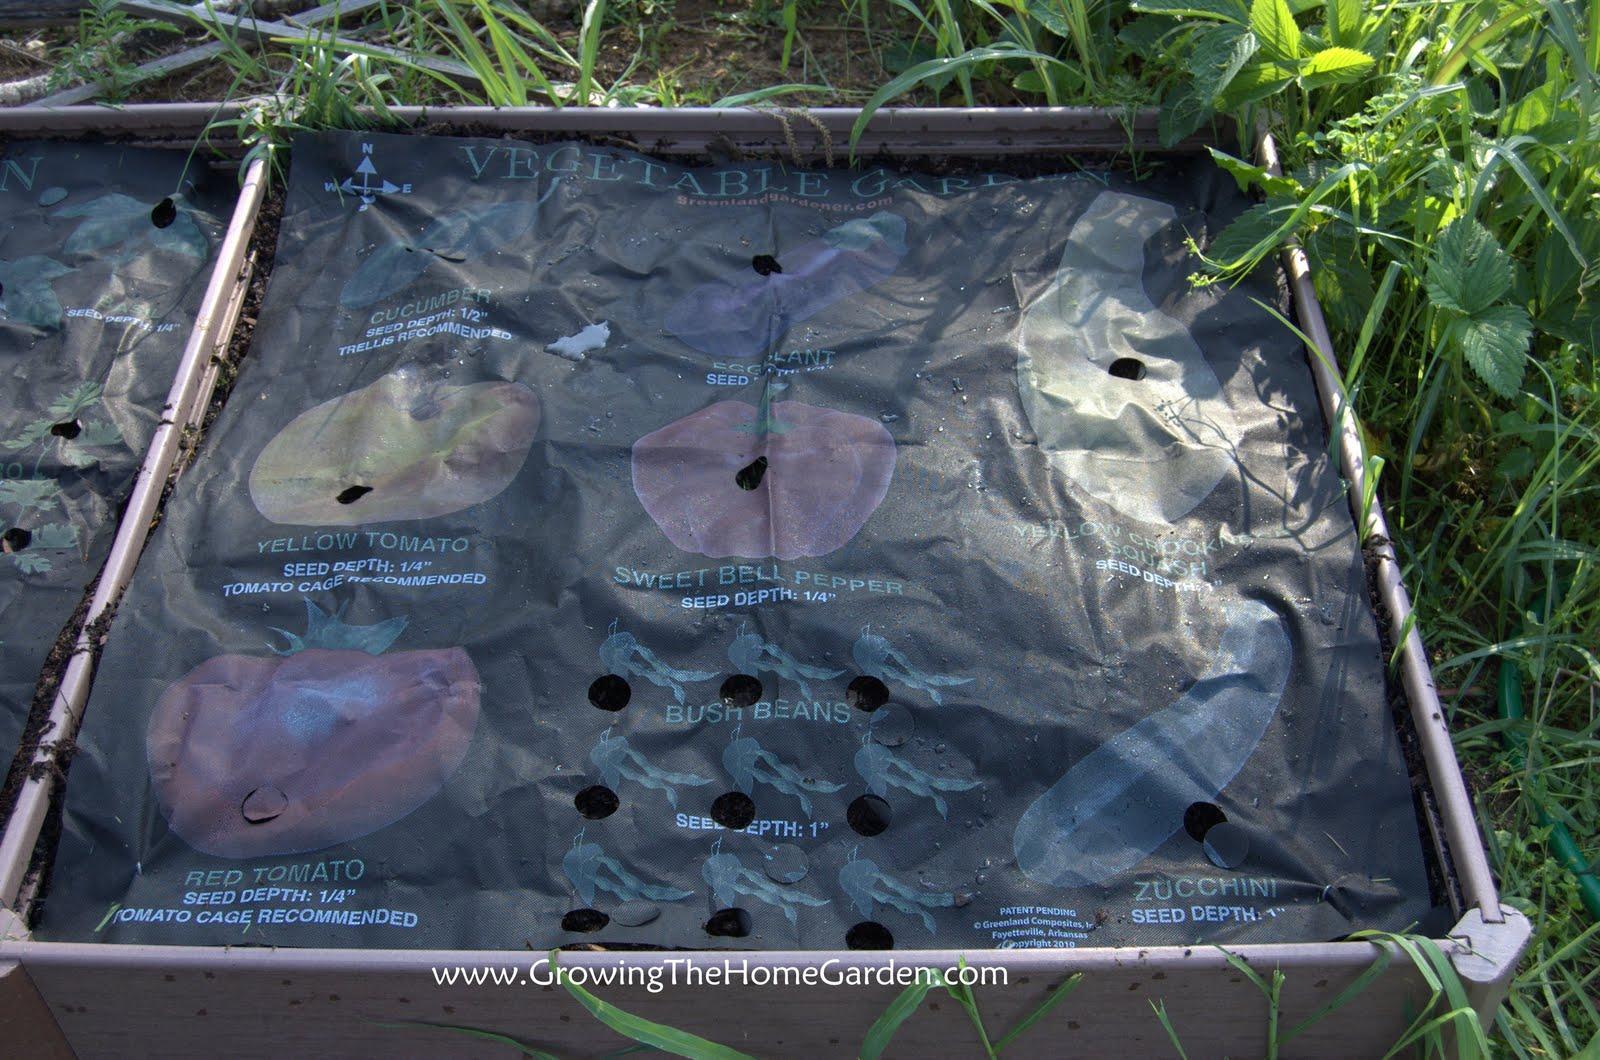 Greenland gardener raised bed garden kit - Greenland Gardener Raised Beds Part 2